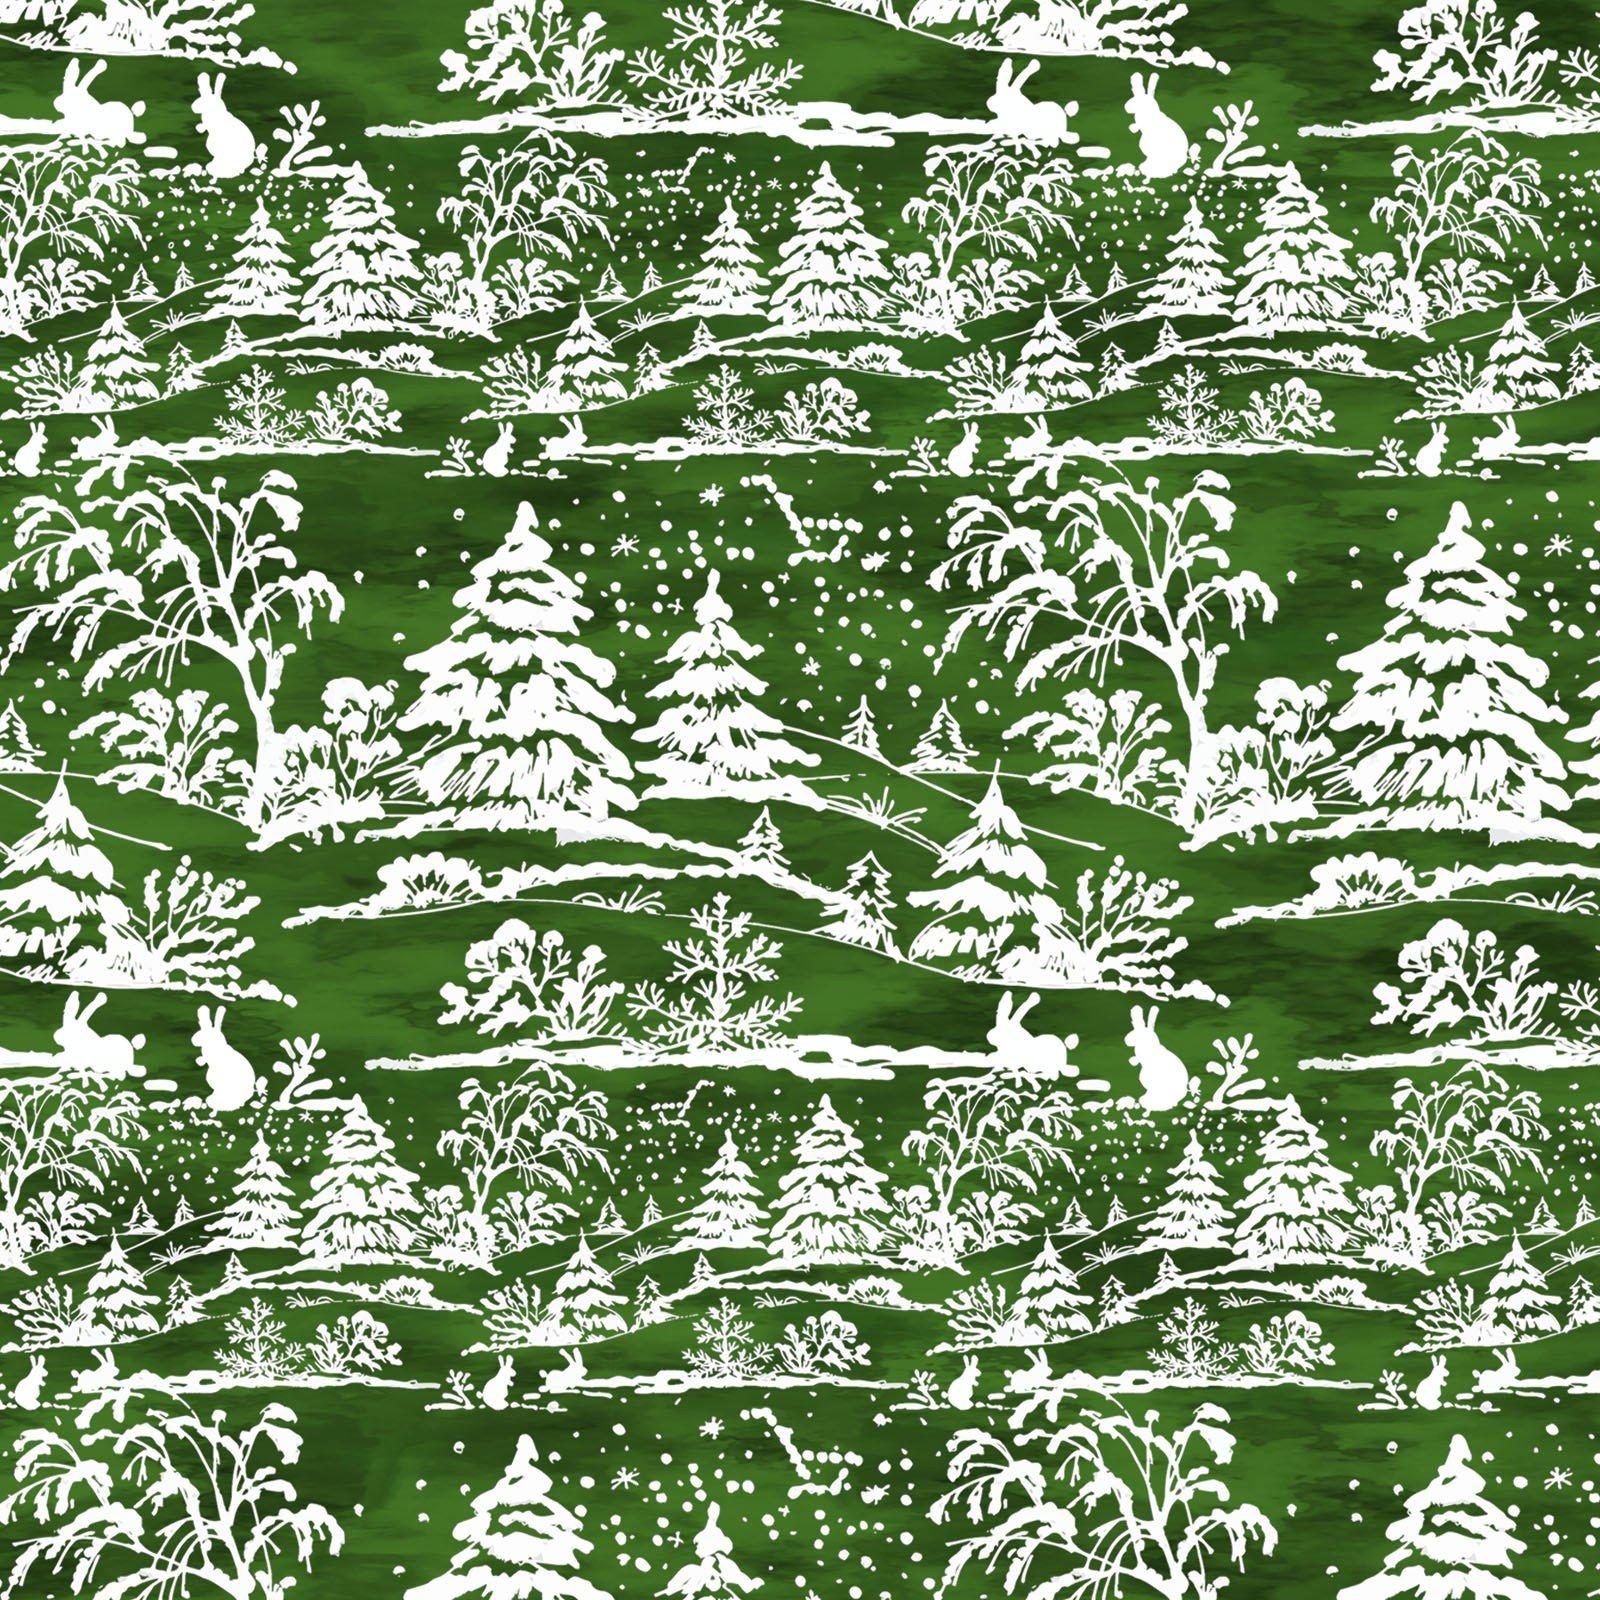 A Poinsettia Winter - Green Digital 6APW 2